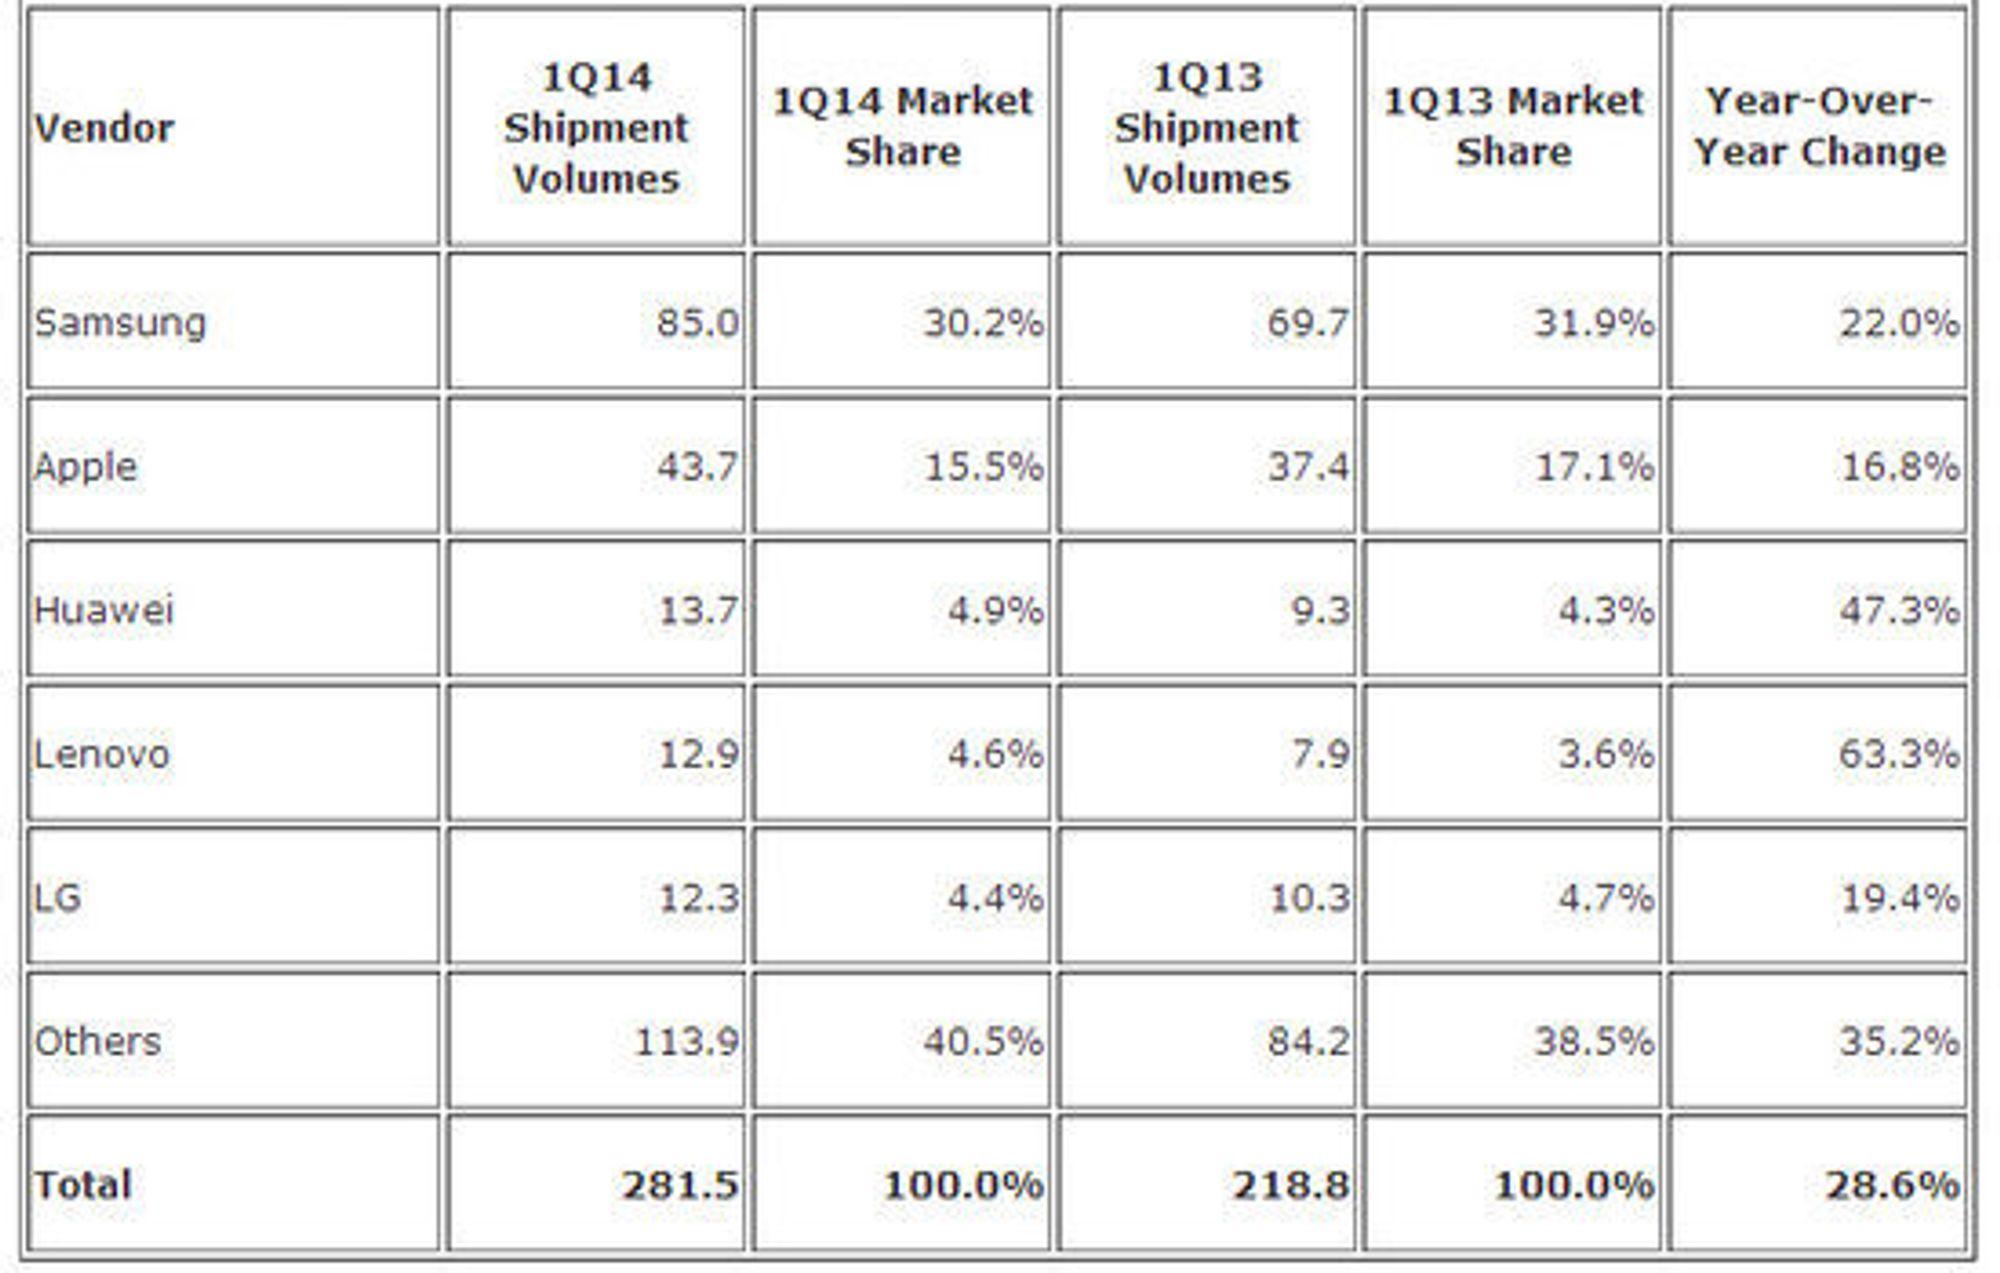 Foreløpige tall fra IDC om andelen til de største leverandørene i smartmobilmarkedet for første kvartal i 2014.